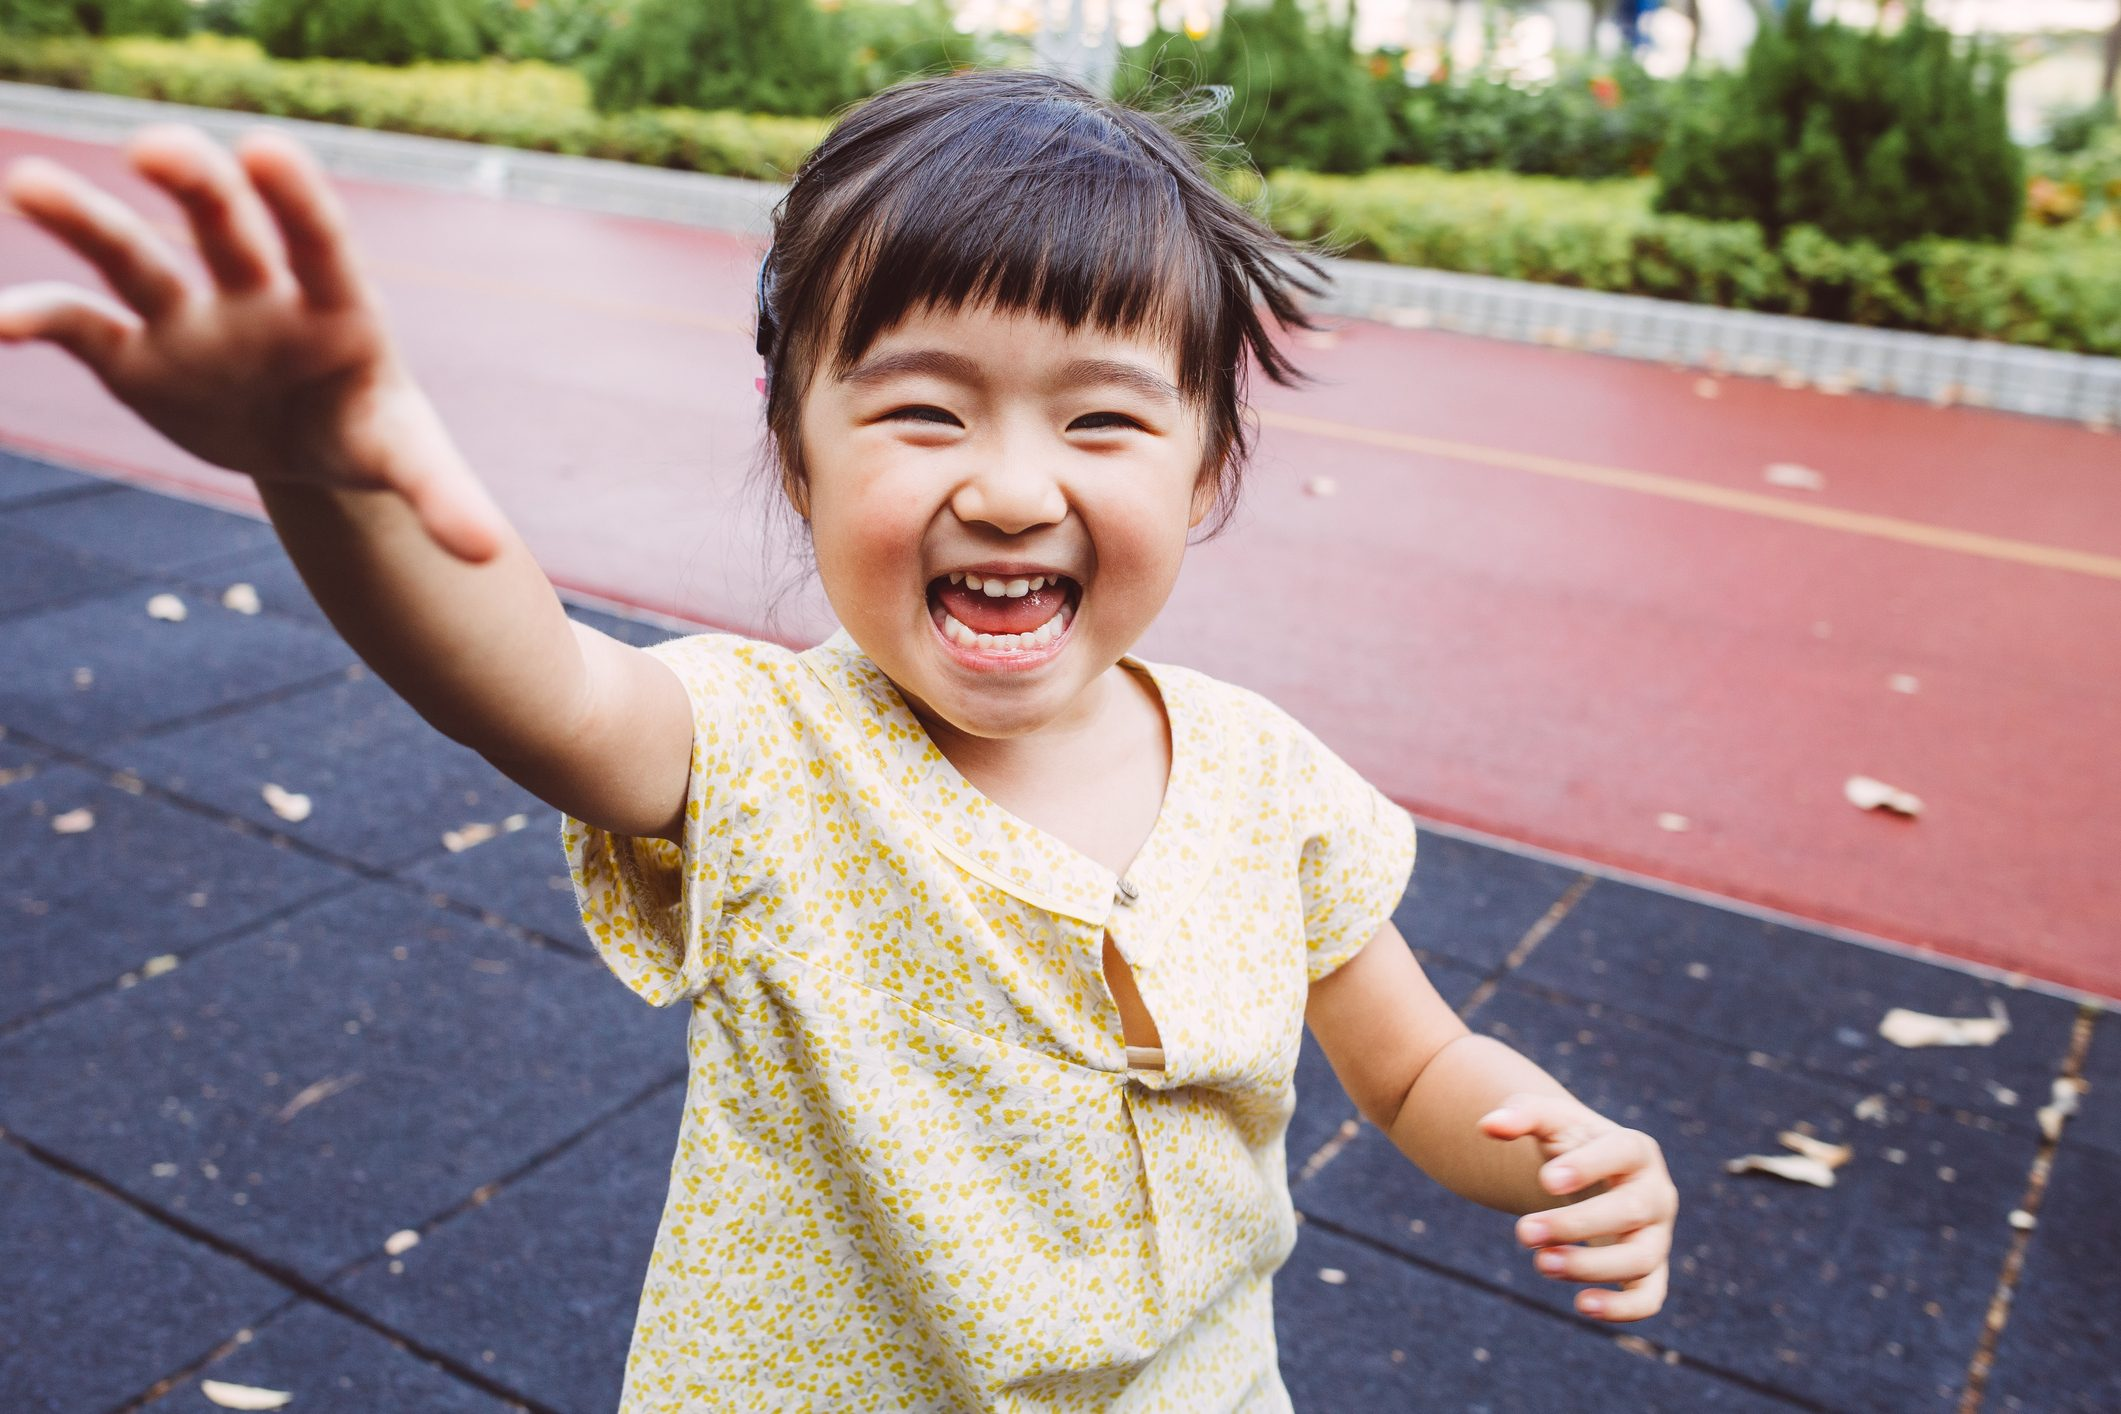 Toddler smiling joyfully at the camera in park